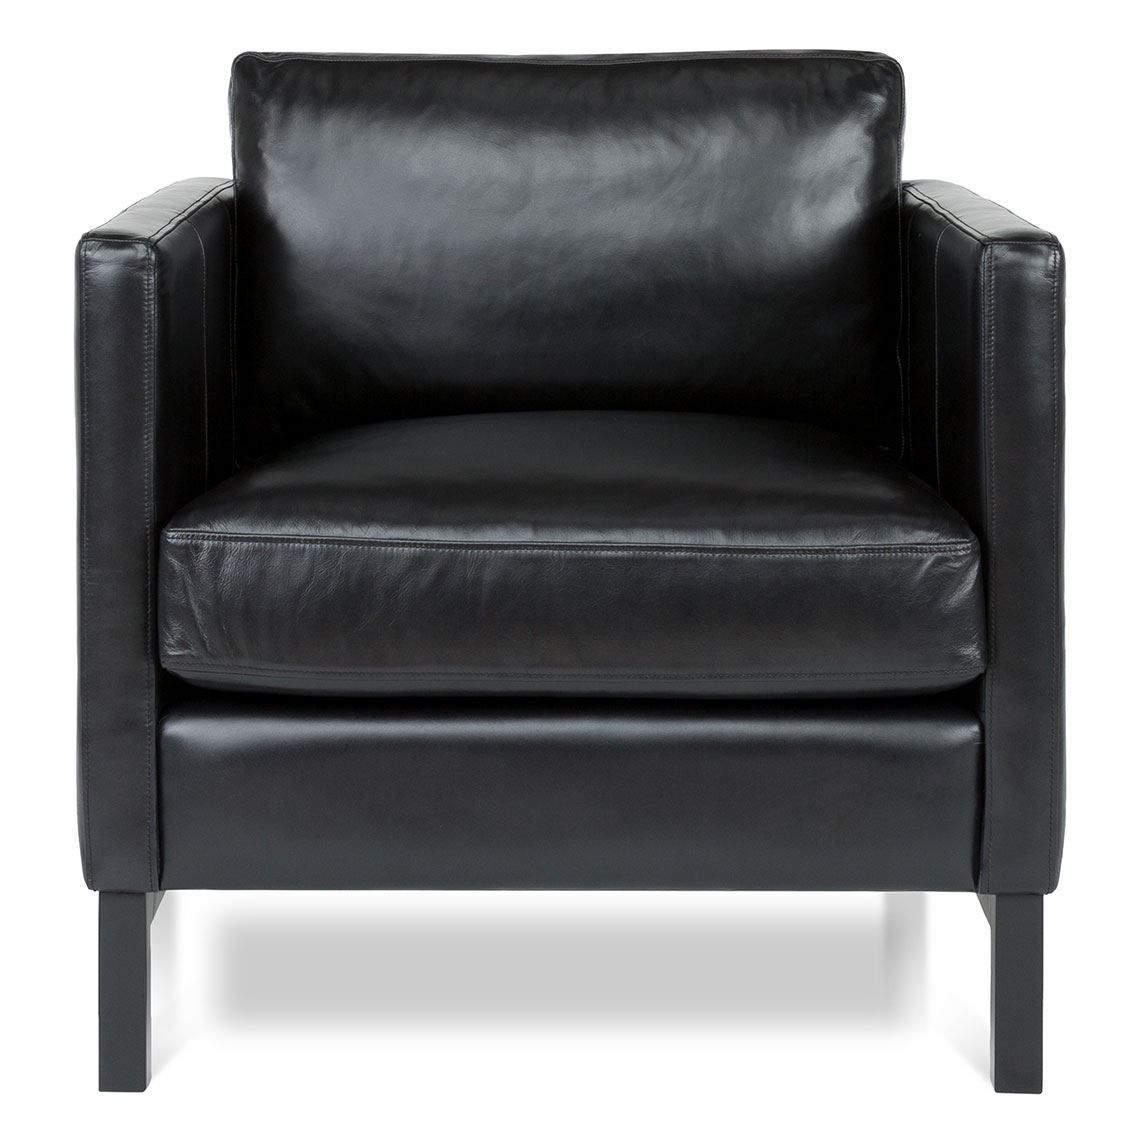 Charmant Atelier Leather Armchair